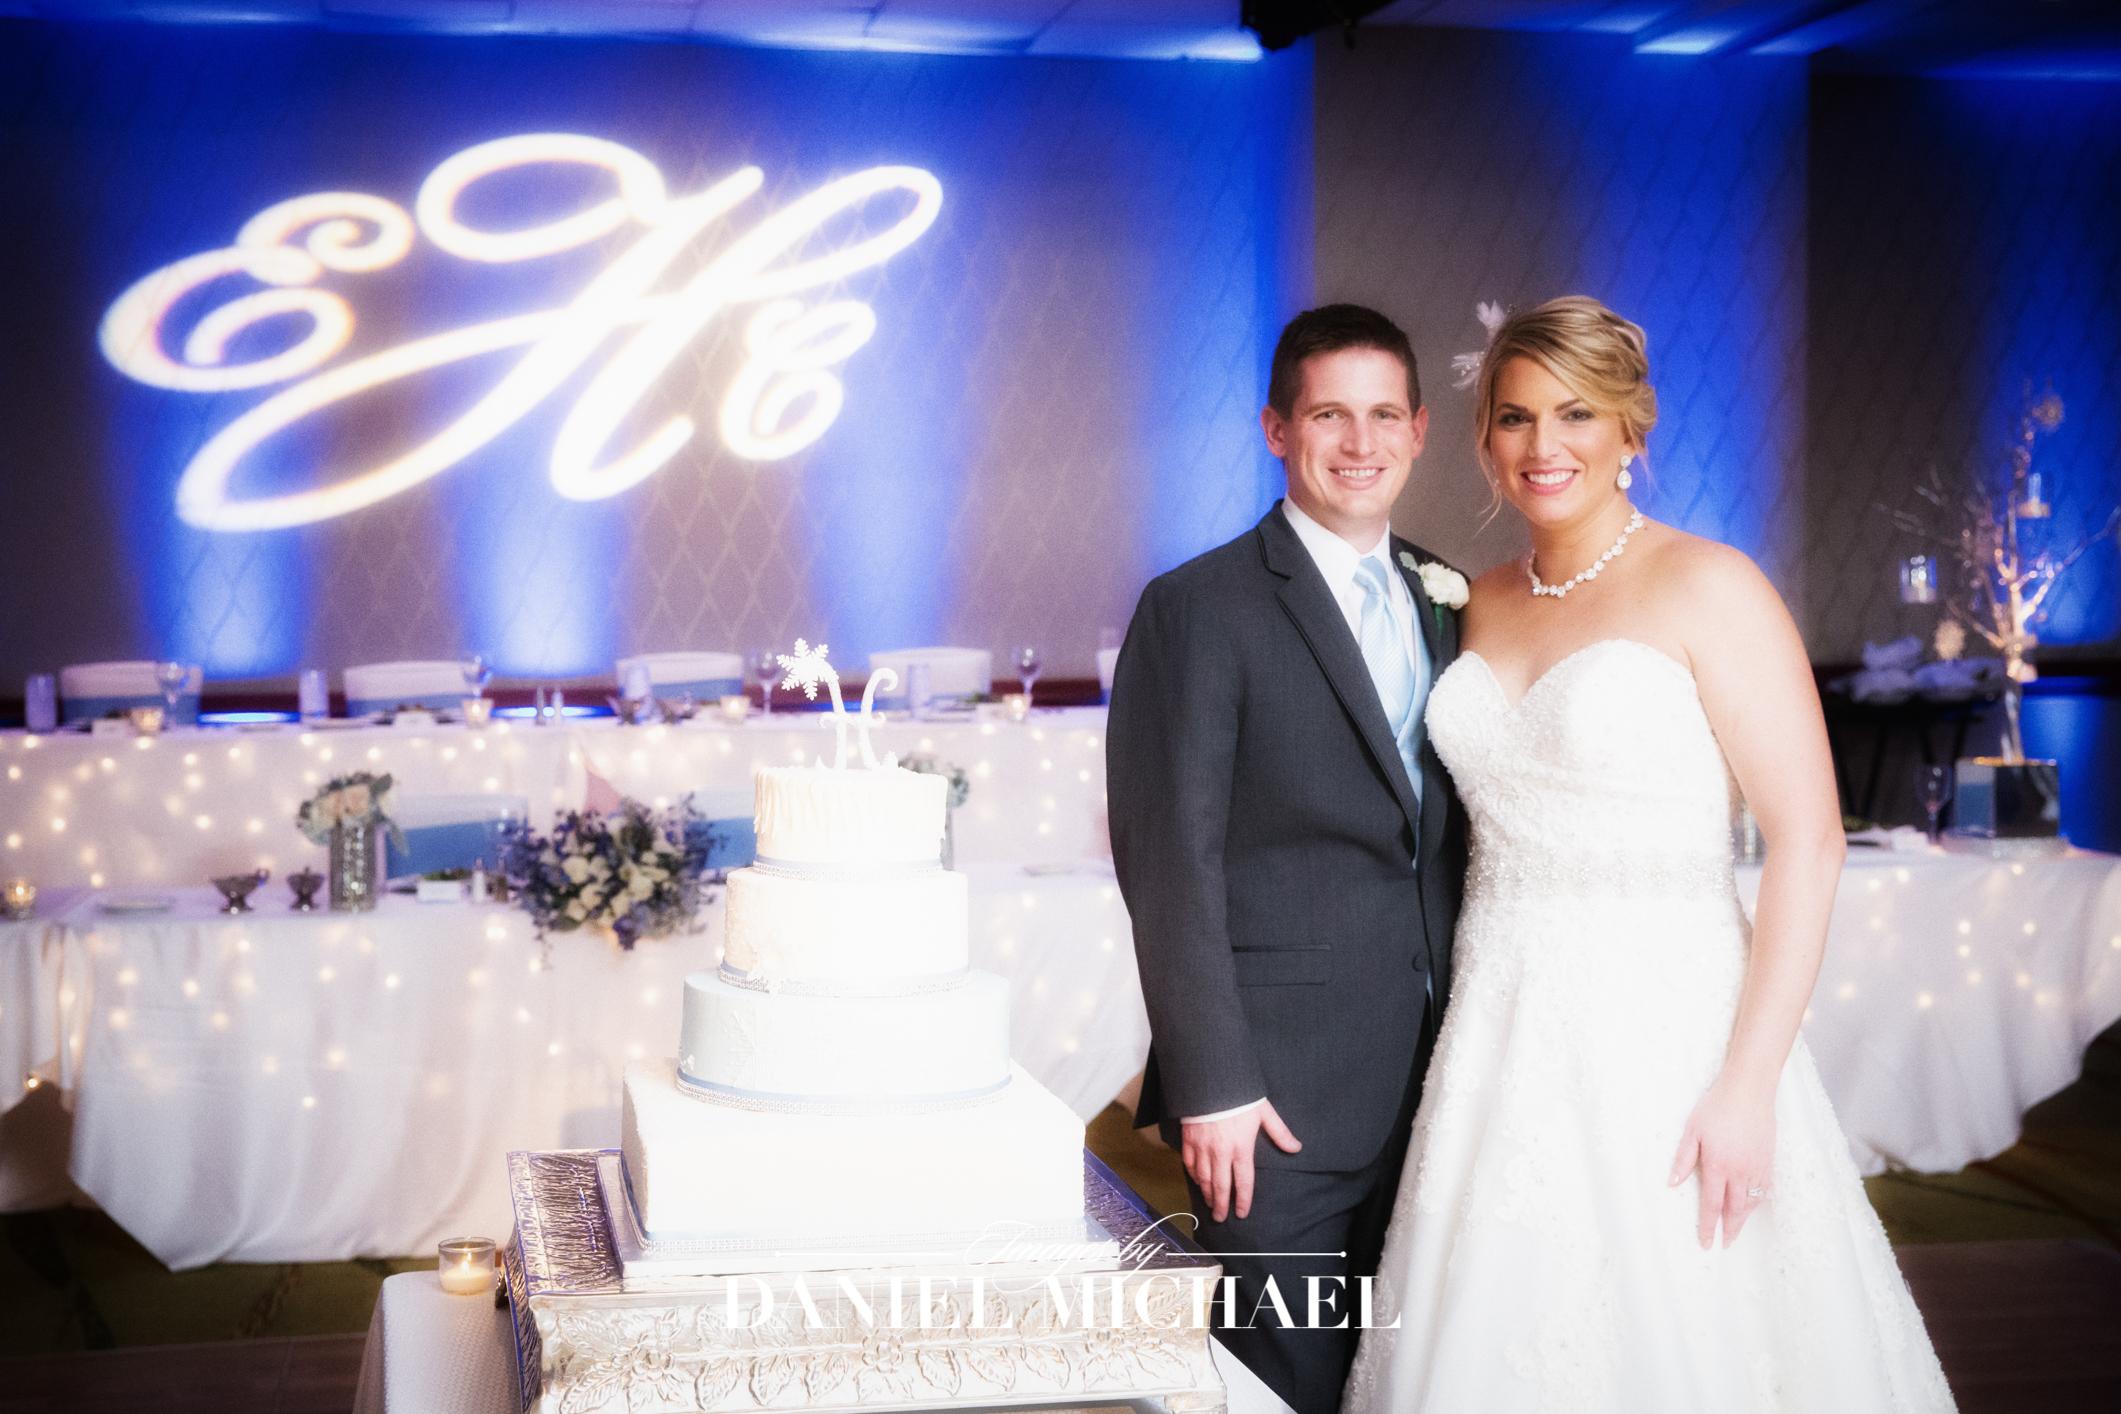 Marriott River Center Venue Wedding Photography